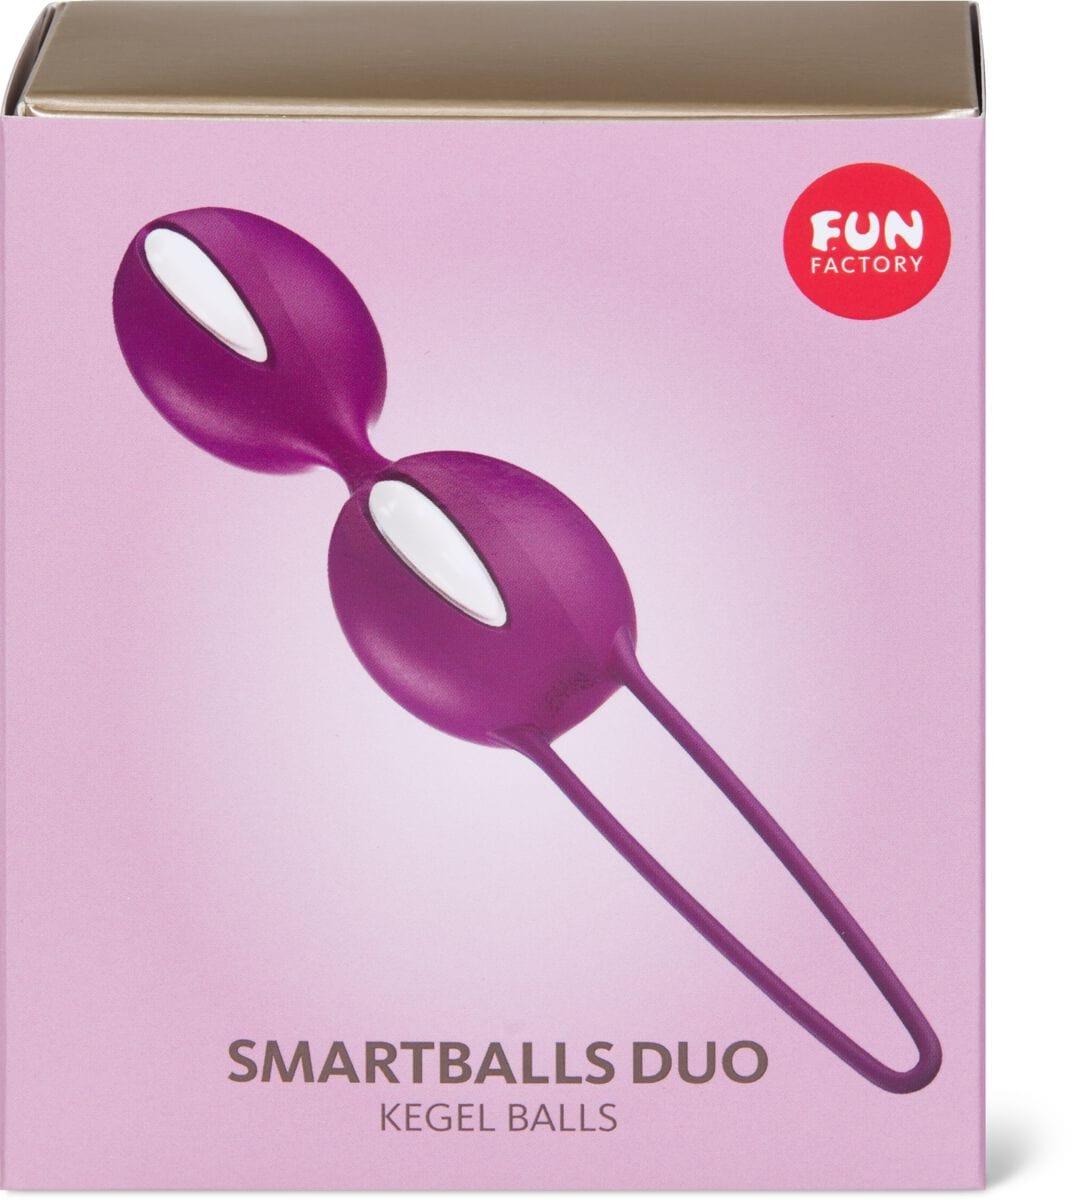 Fun Factory Smartballs Duo